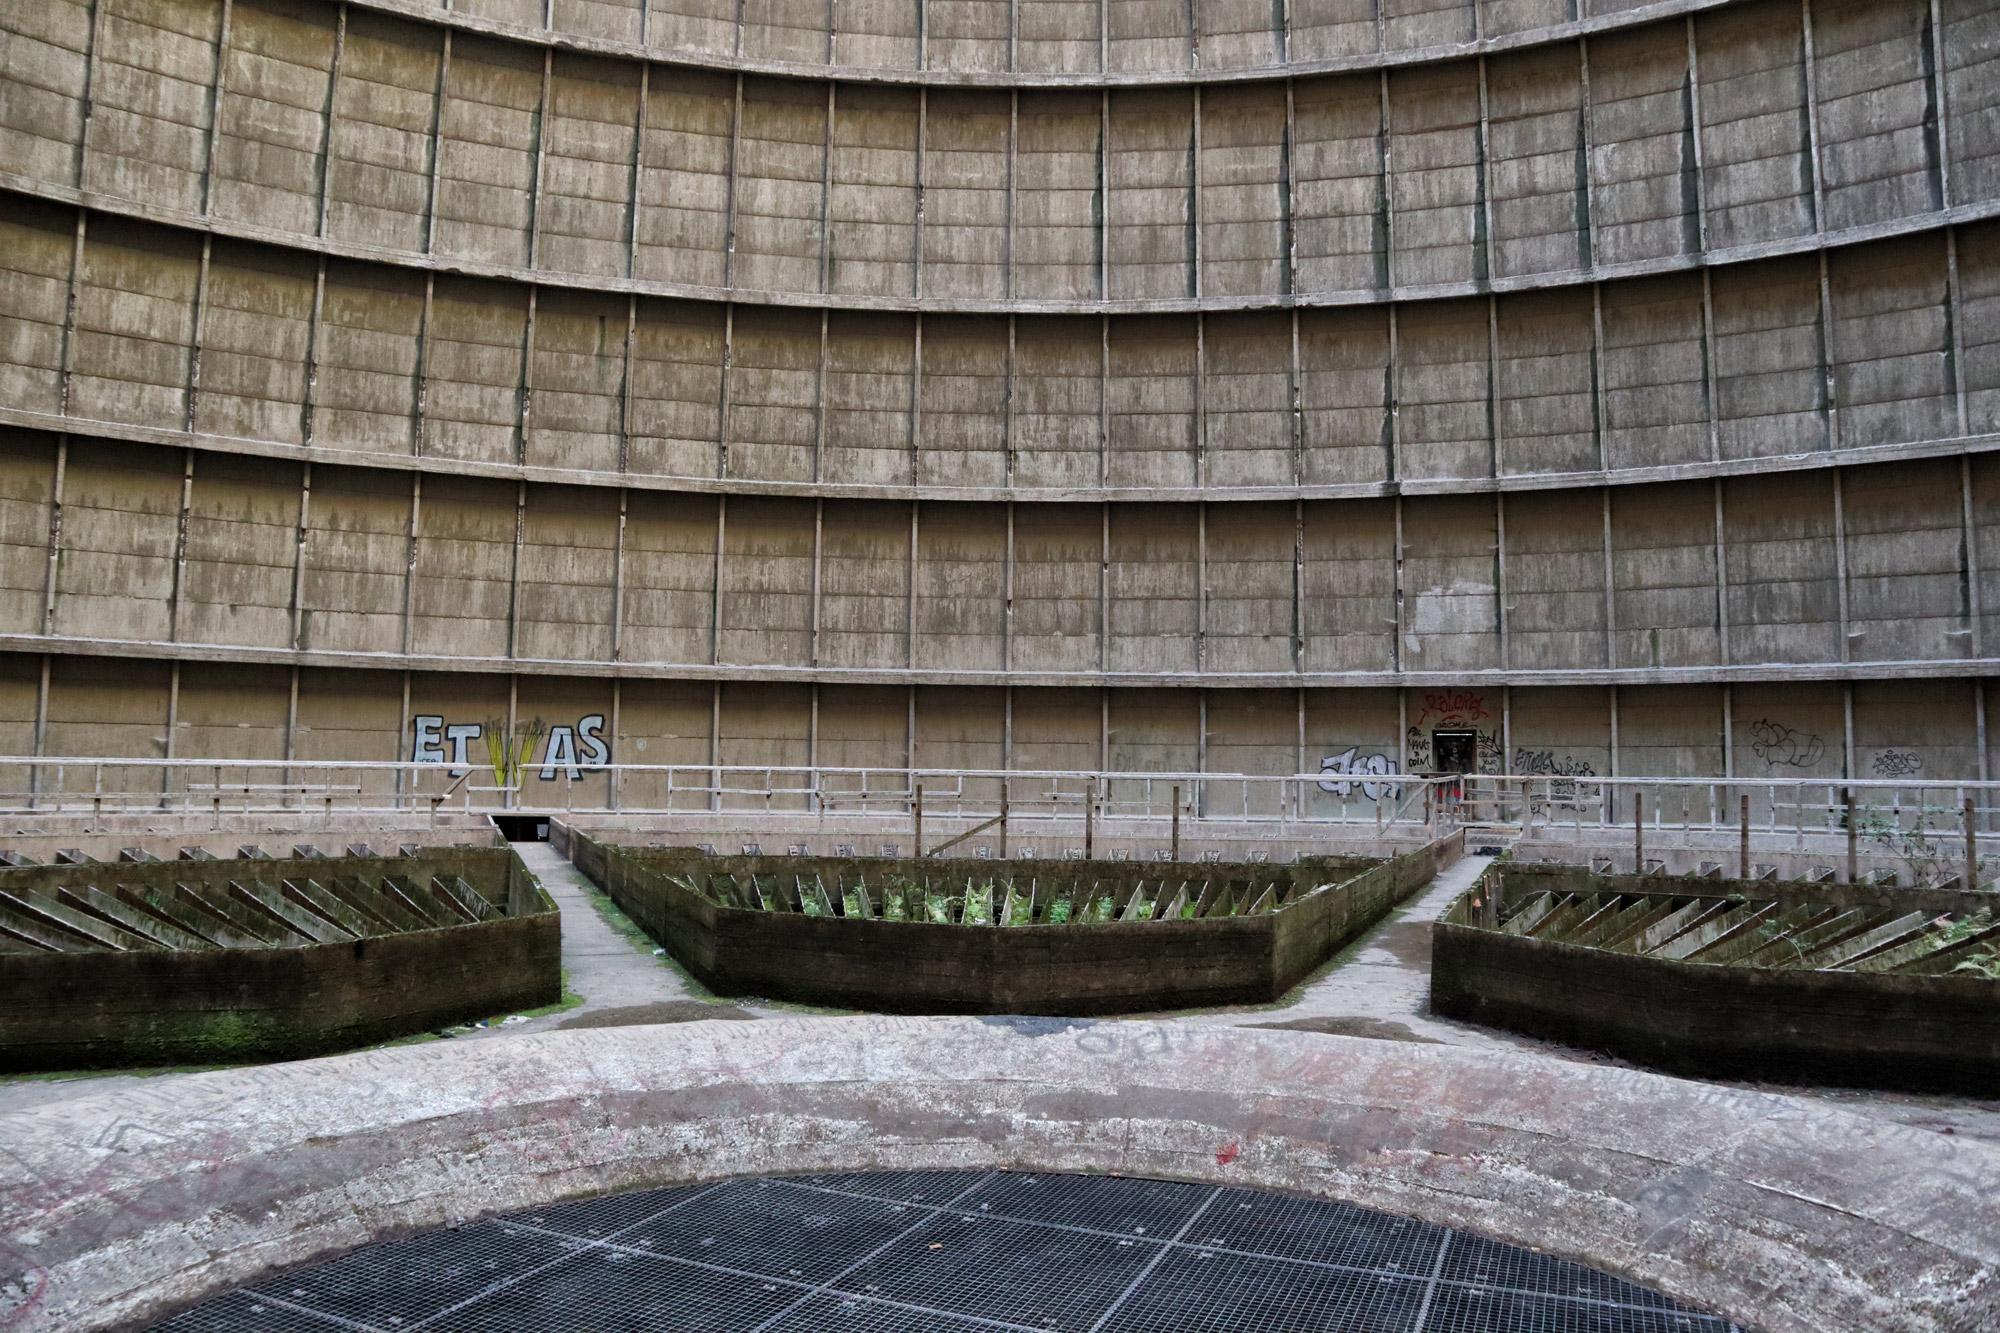 Urbex: IM Cooling Tower